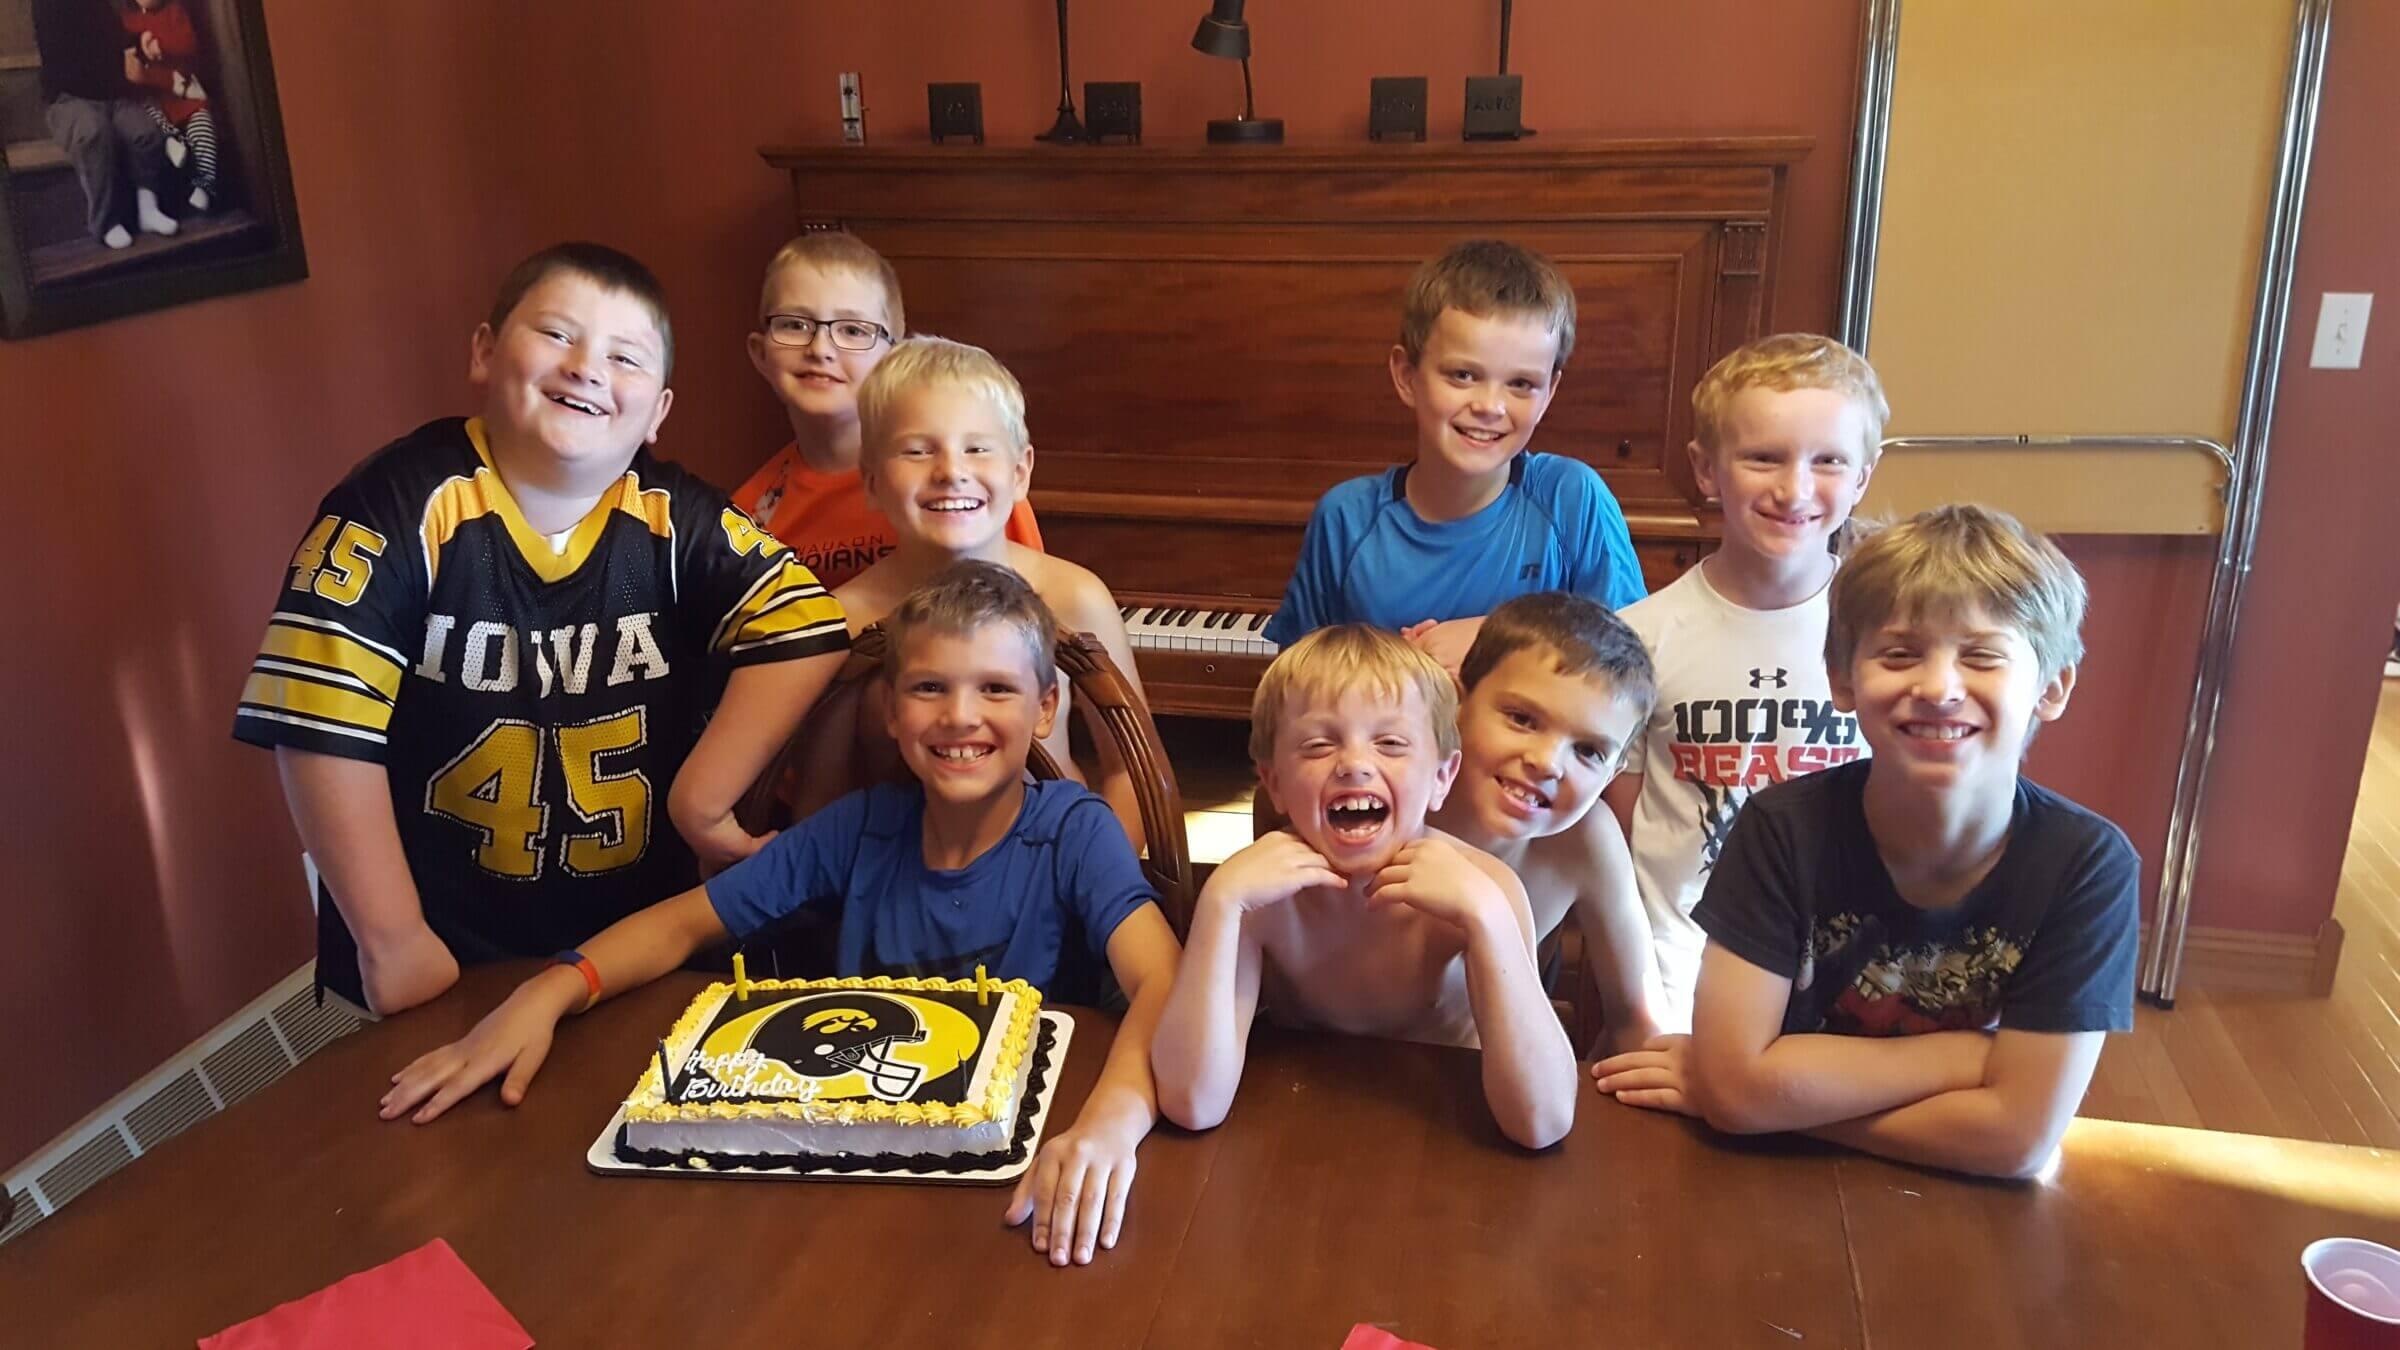 Boys birthday party with gluten free Iowa Hawkeyes cake